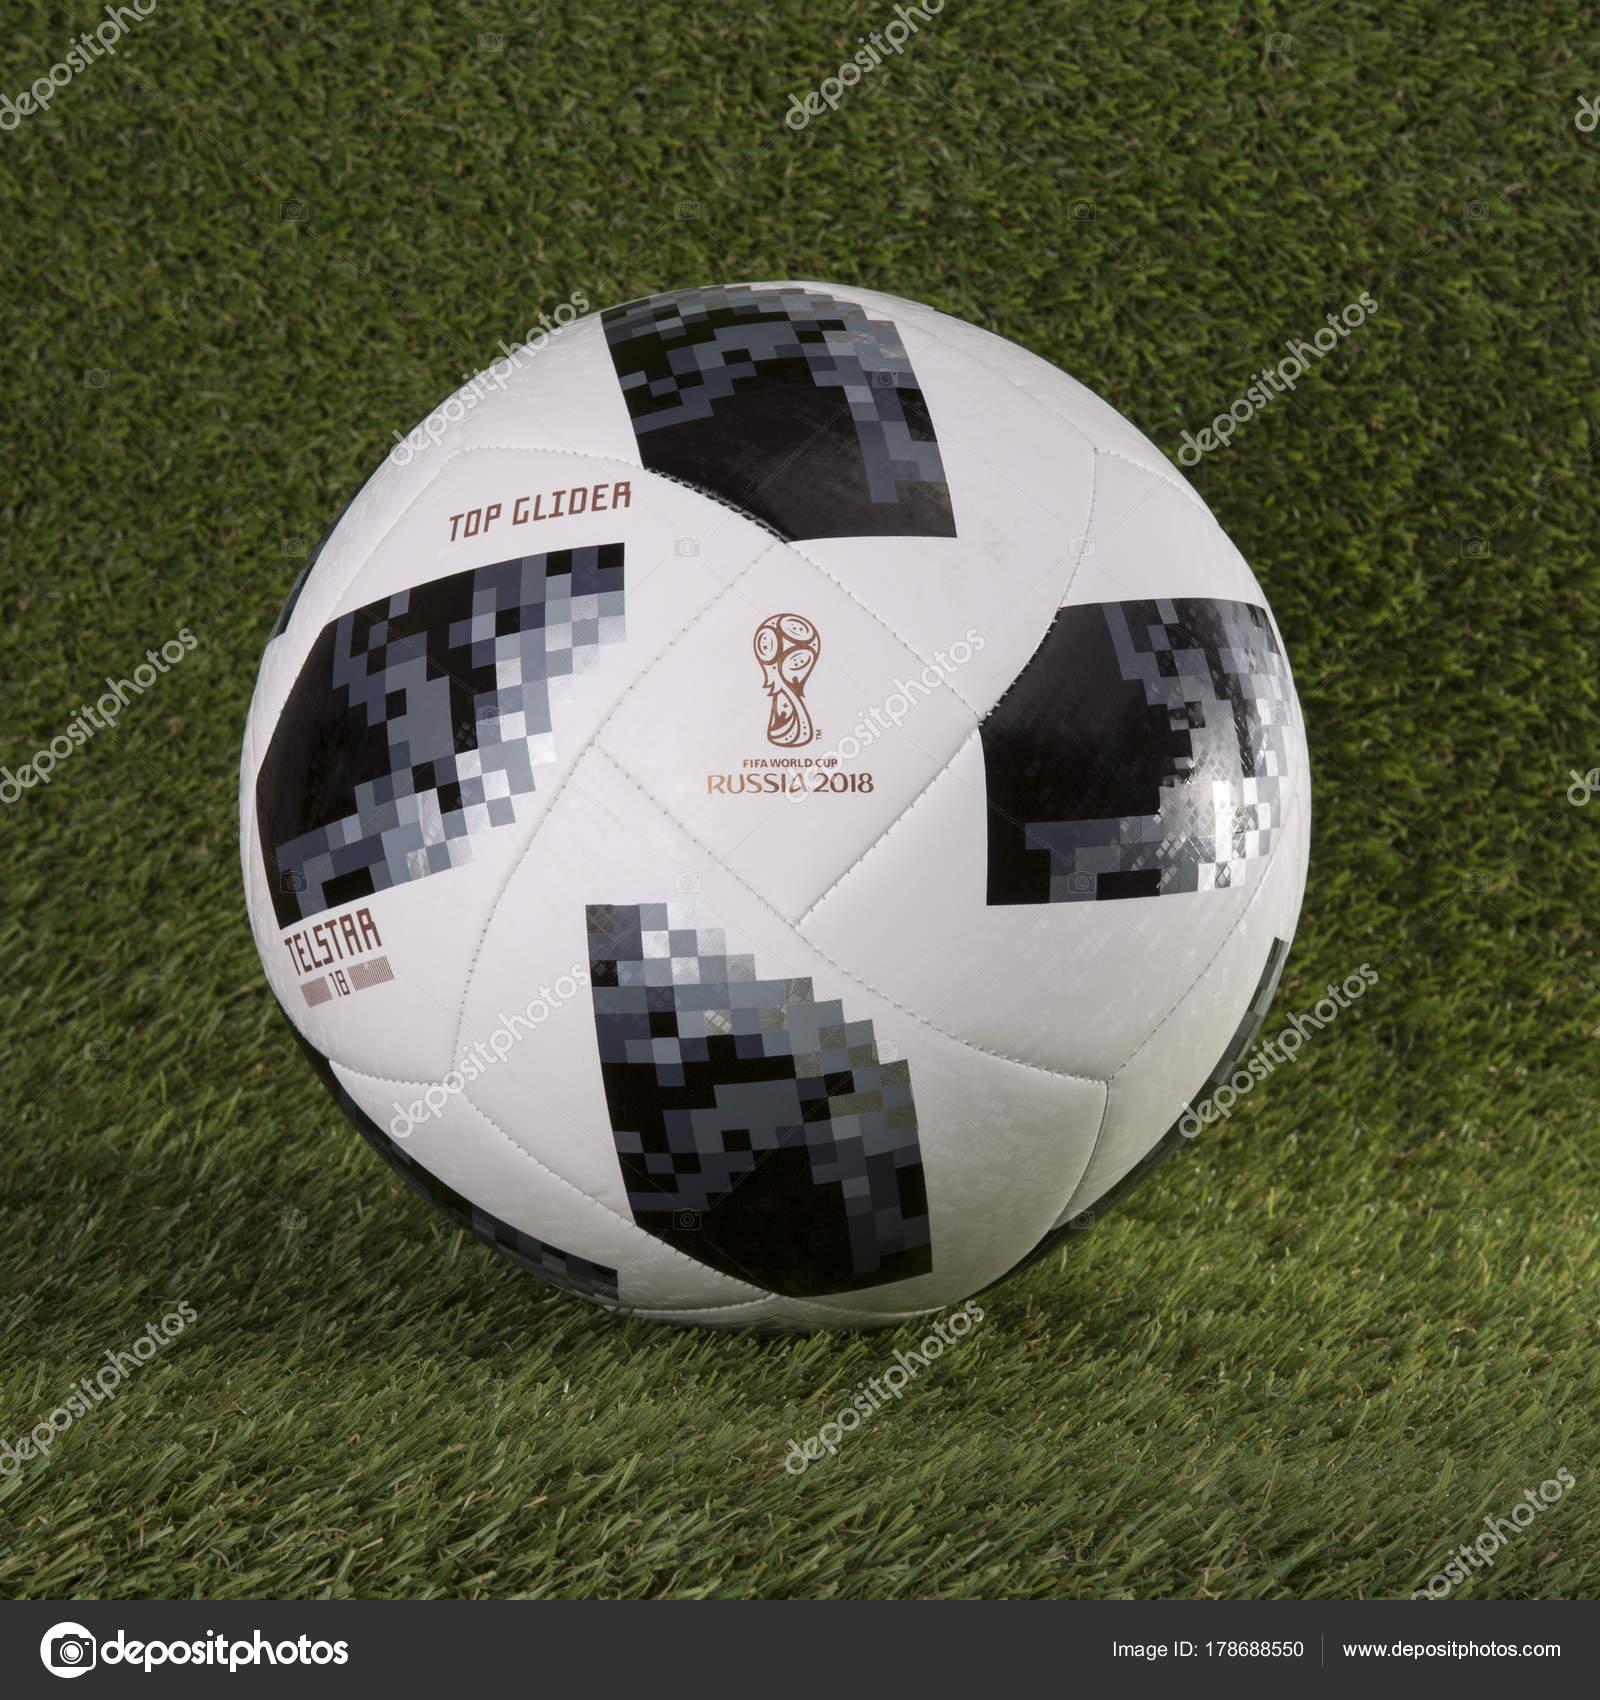 Beautiful Football Ball World Cup 2018 - depositphotos_178688550-stock-photo-telstar-top-glider-world-cup  Gallery_577751 .jpg